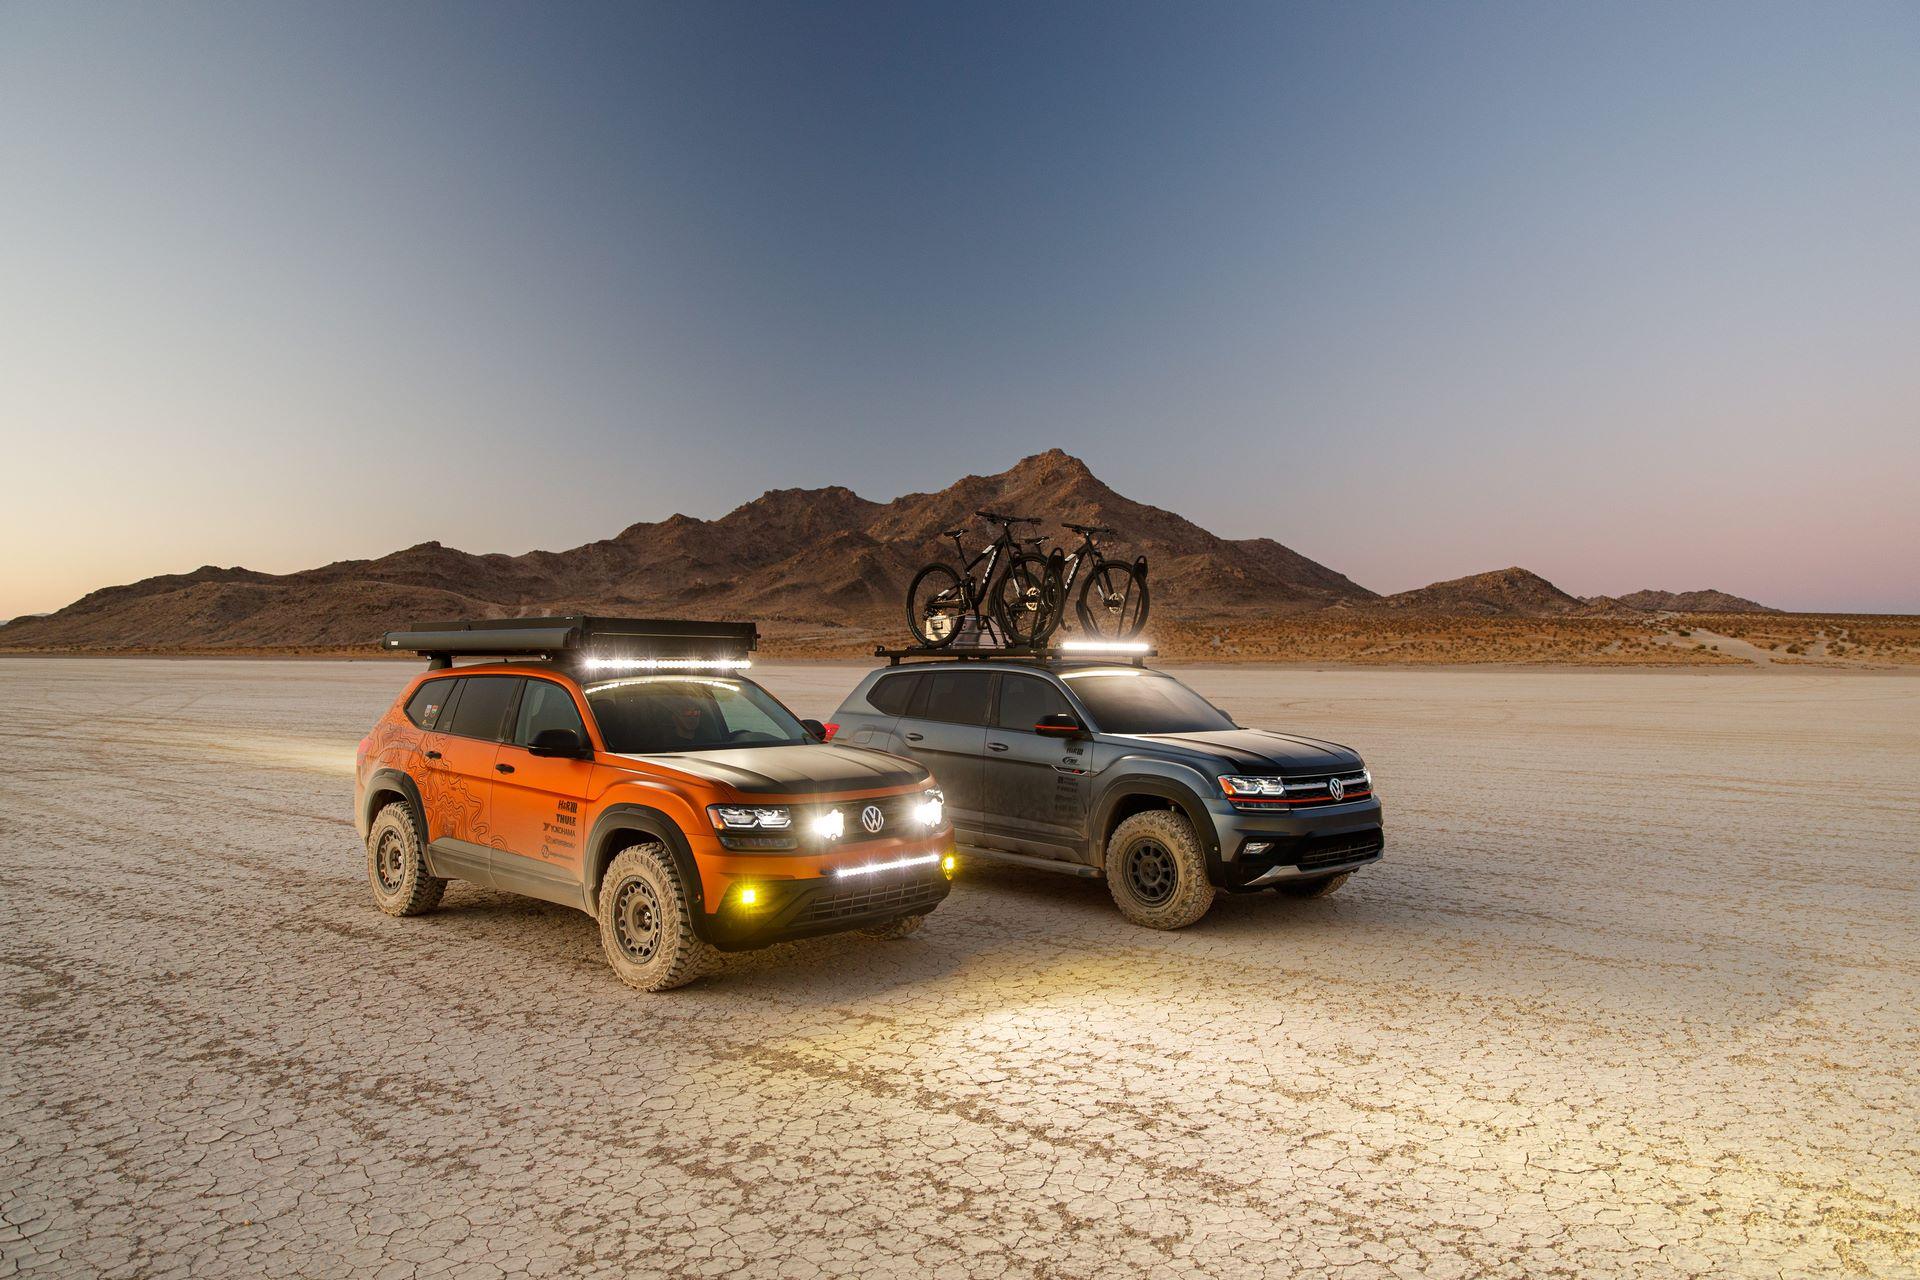 Volkswagen_Atlas_Adventure_Concept_and_Atlas_Basecamp_Concept-10450